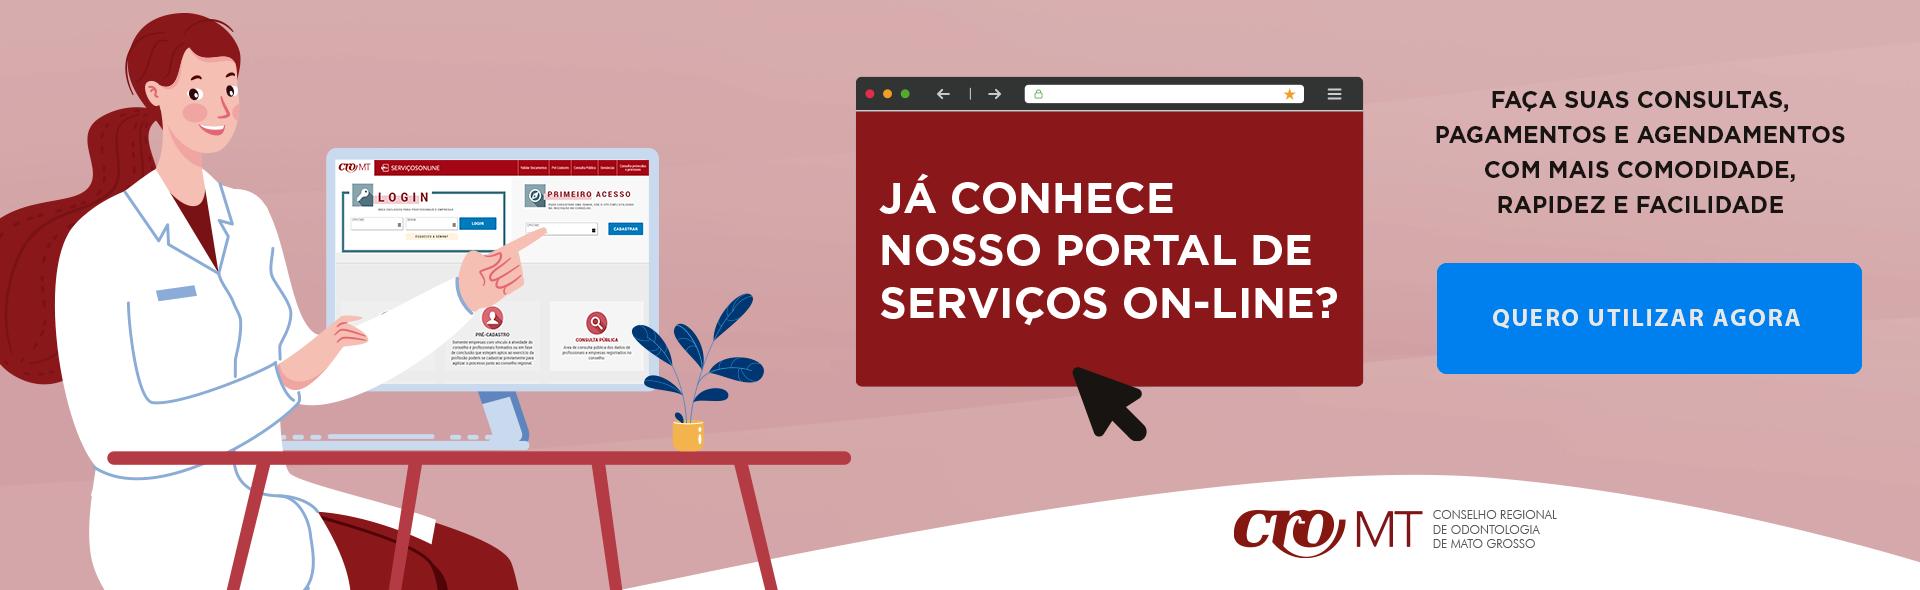 Portal de Serviços On-line